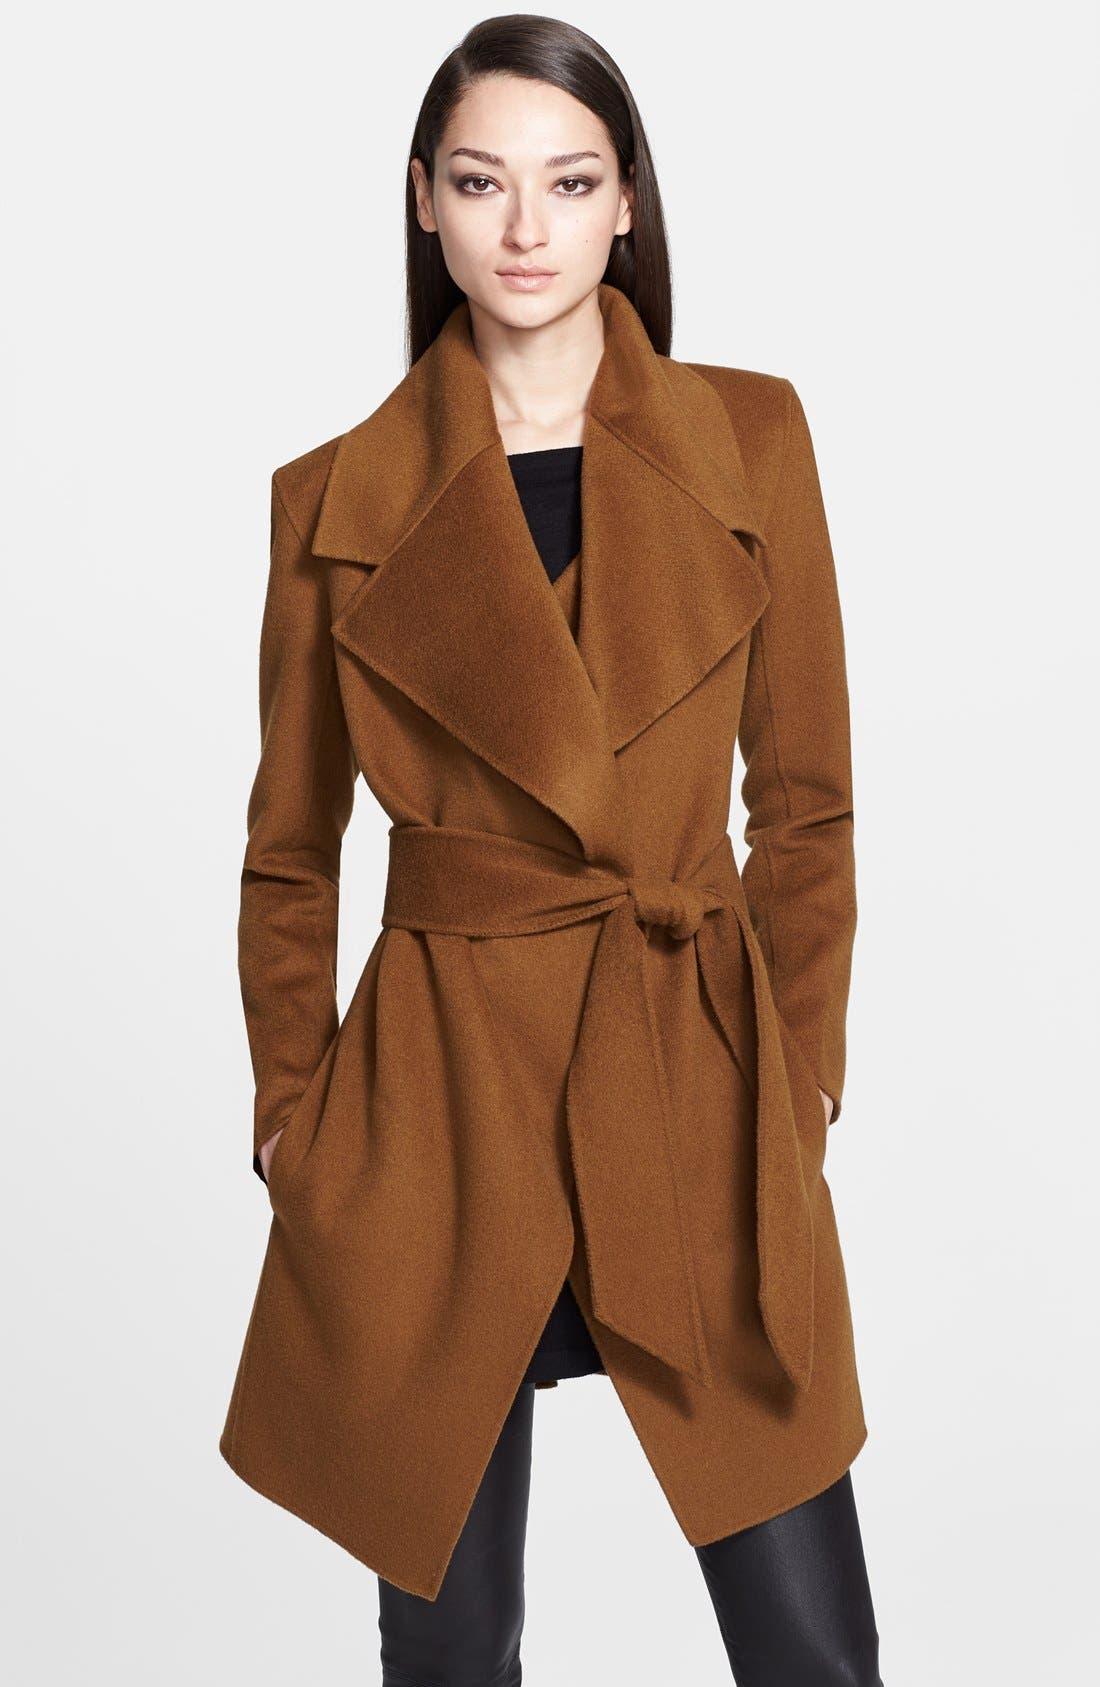 Donna Karan Collection Belted Cashmere Wrap Coat,                             Main thumbnail 1, color,                             930